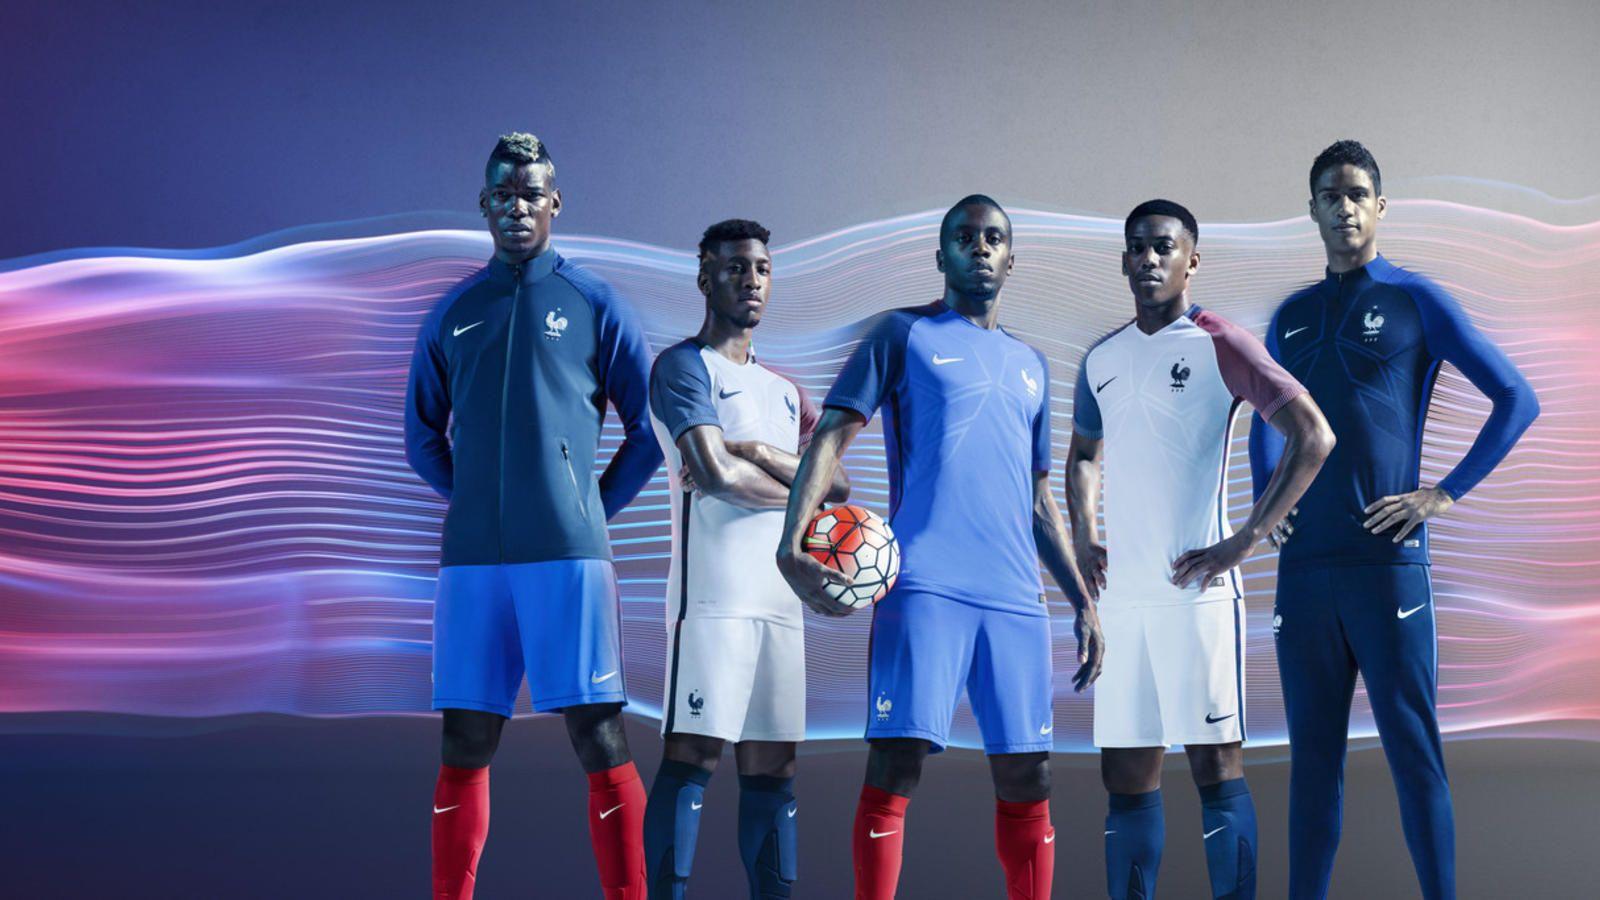 France 2016 National Football Kits France National Football Team National Football Football Kits